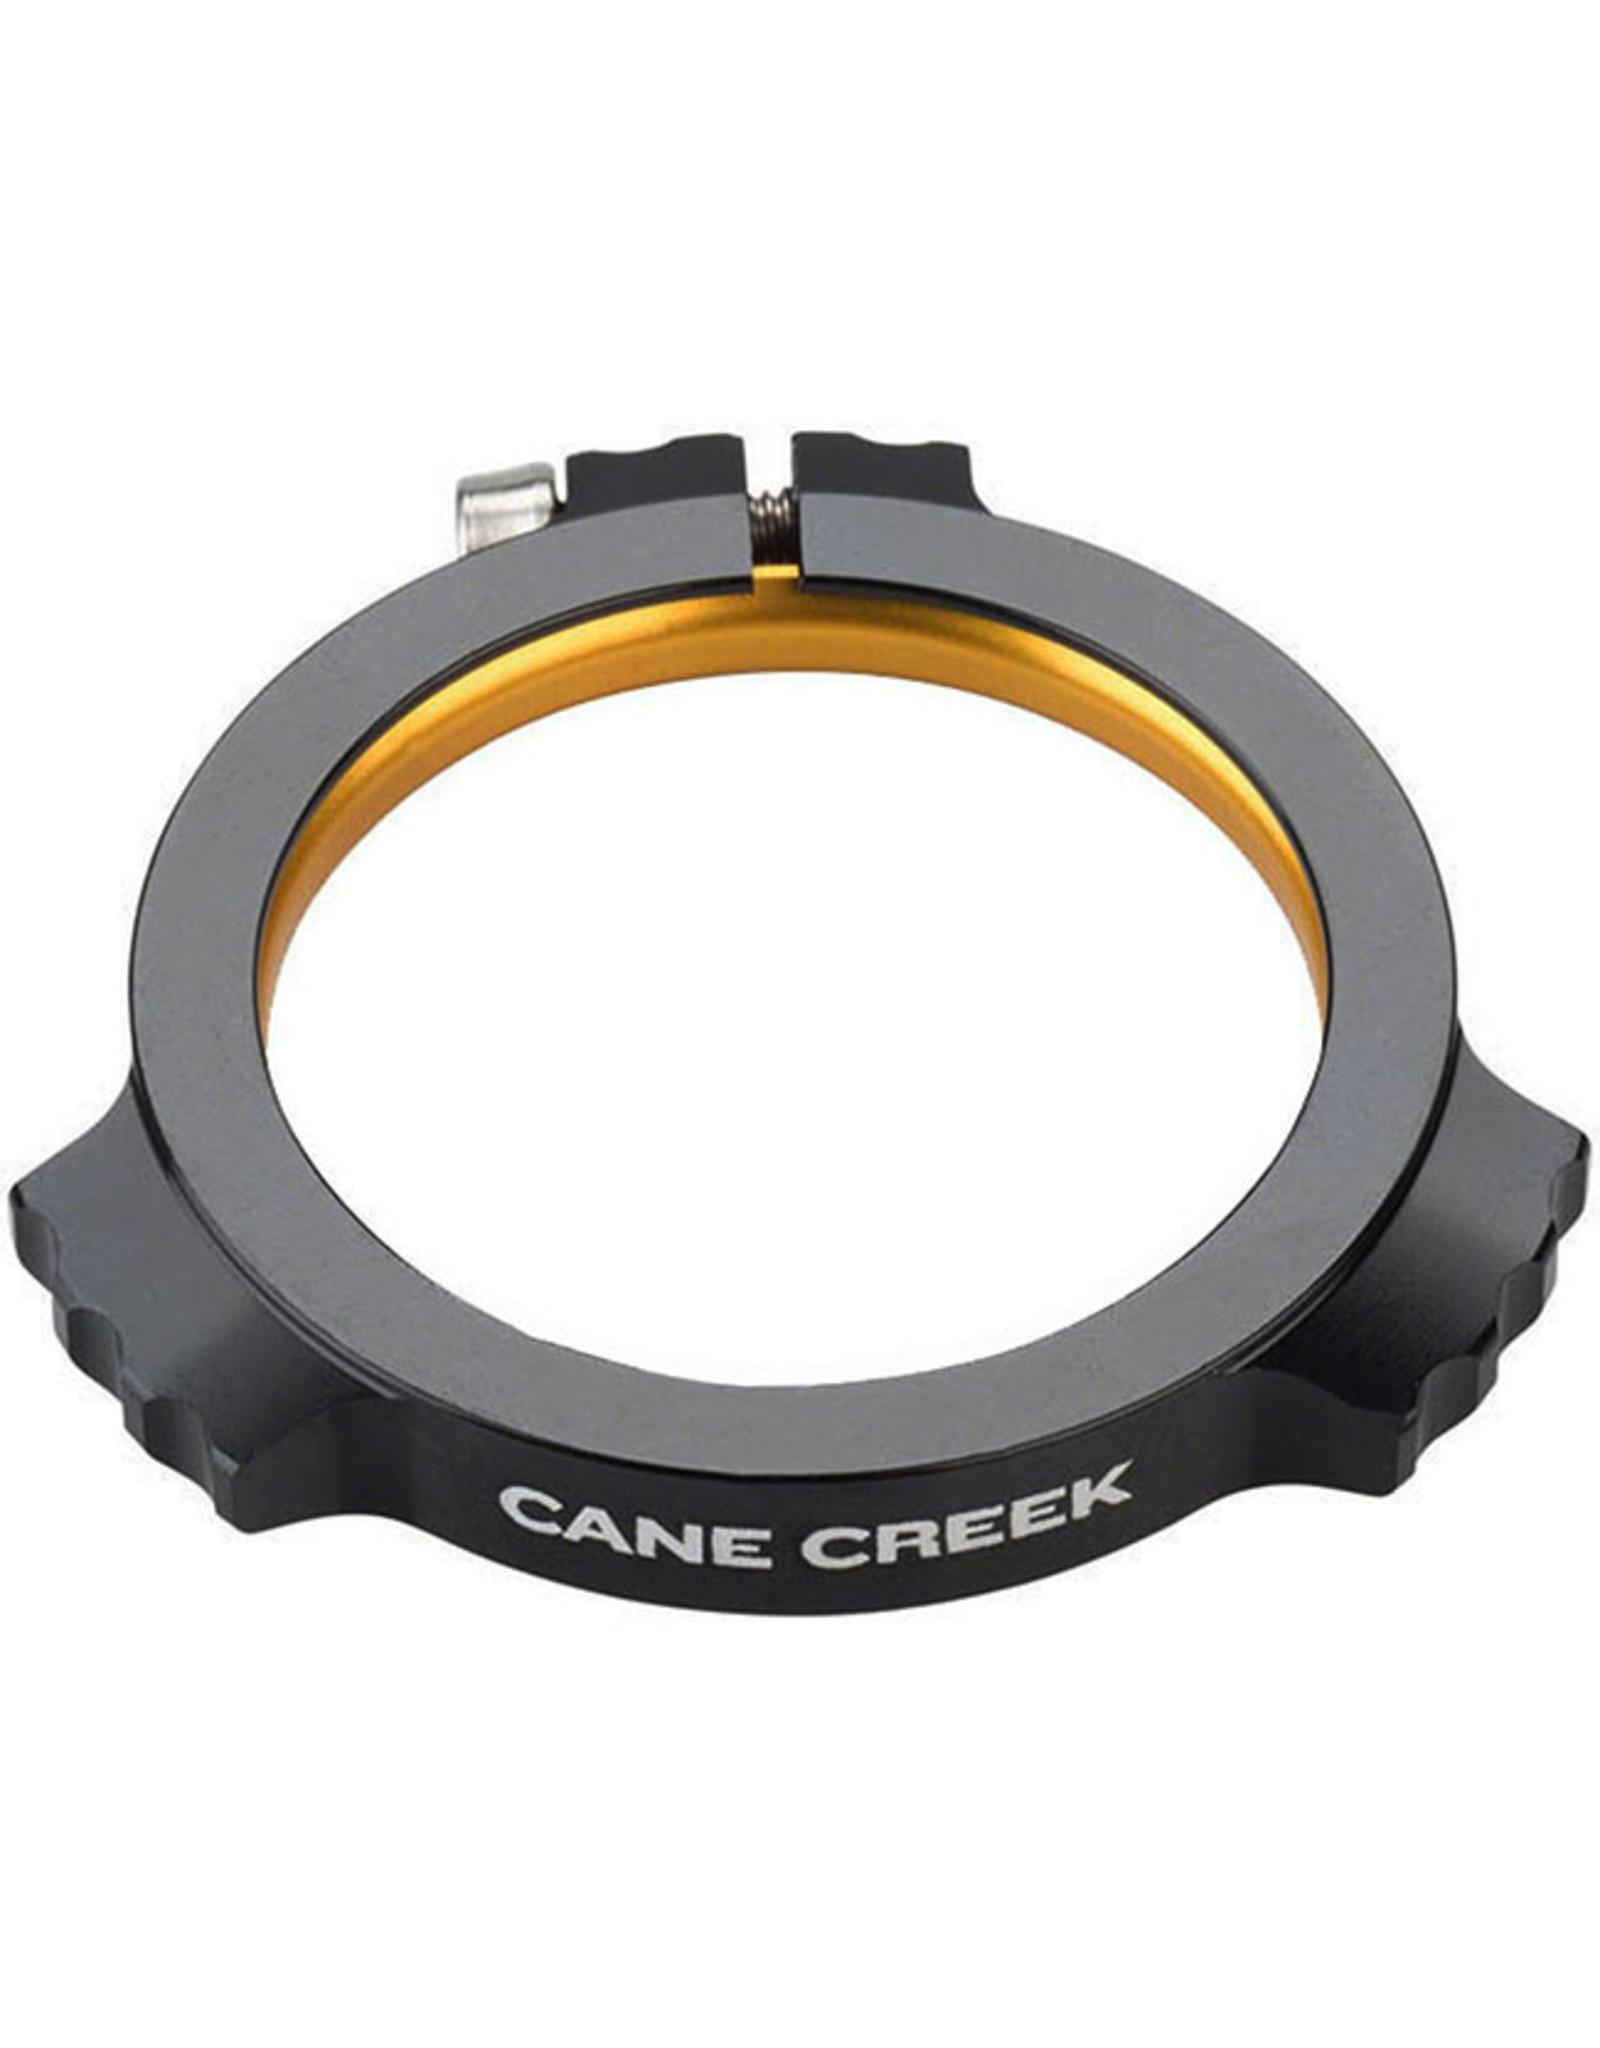 Cane Creek Cane Creek Crank Preloader